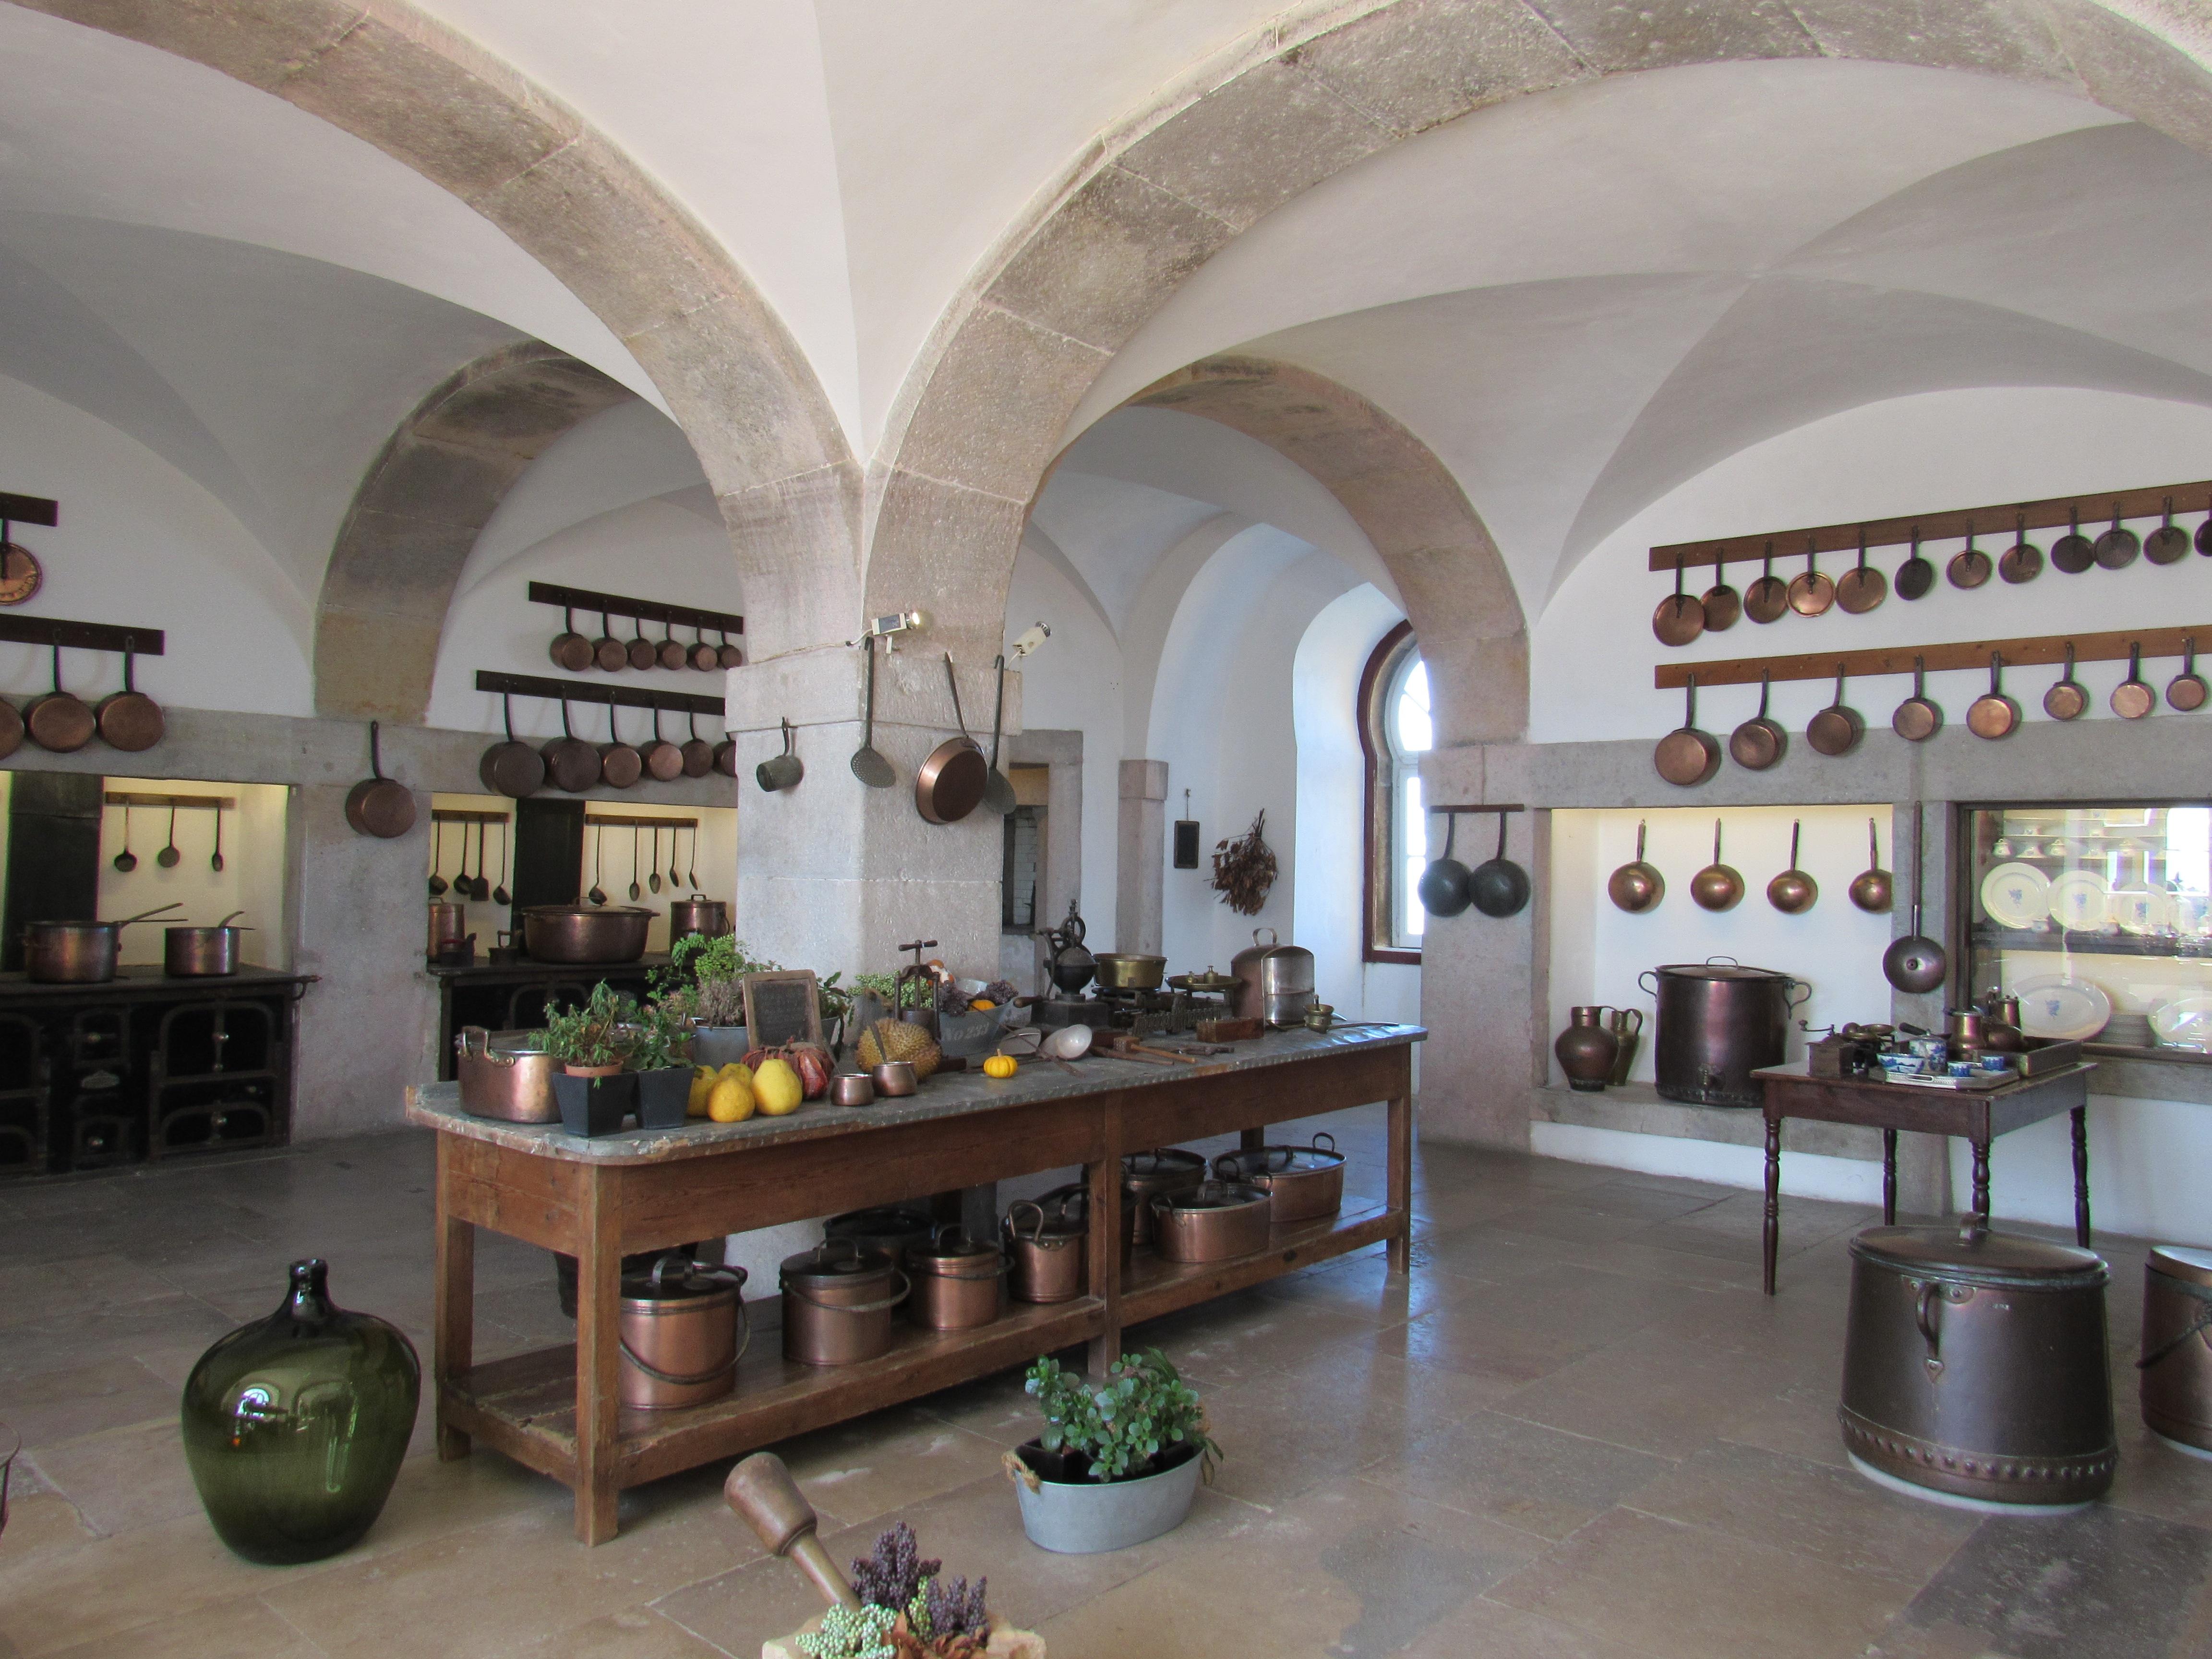 Castle Interior Design Property free images : architecture, building, kitchen, castle, property